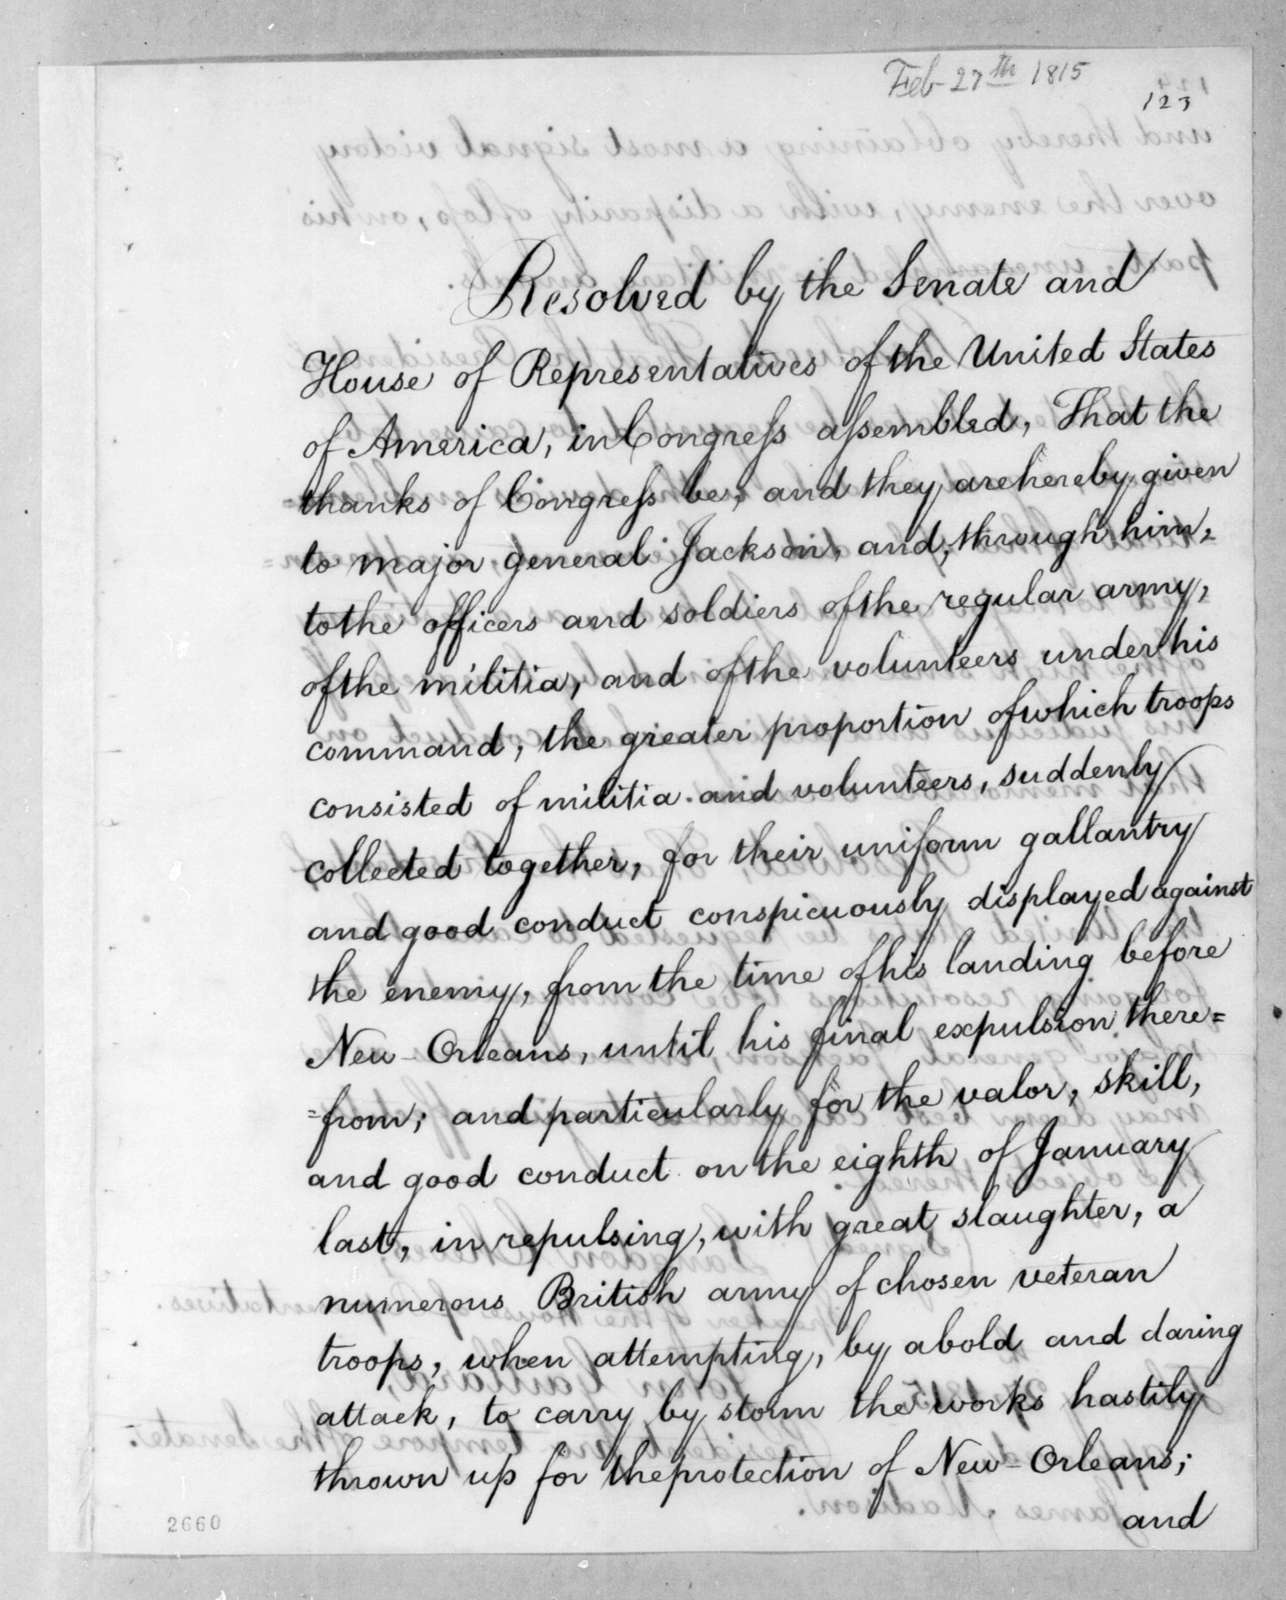 United States Congress, February 27, 1815